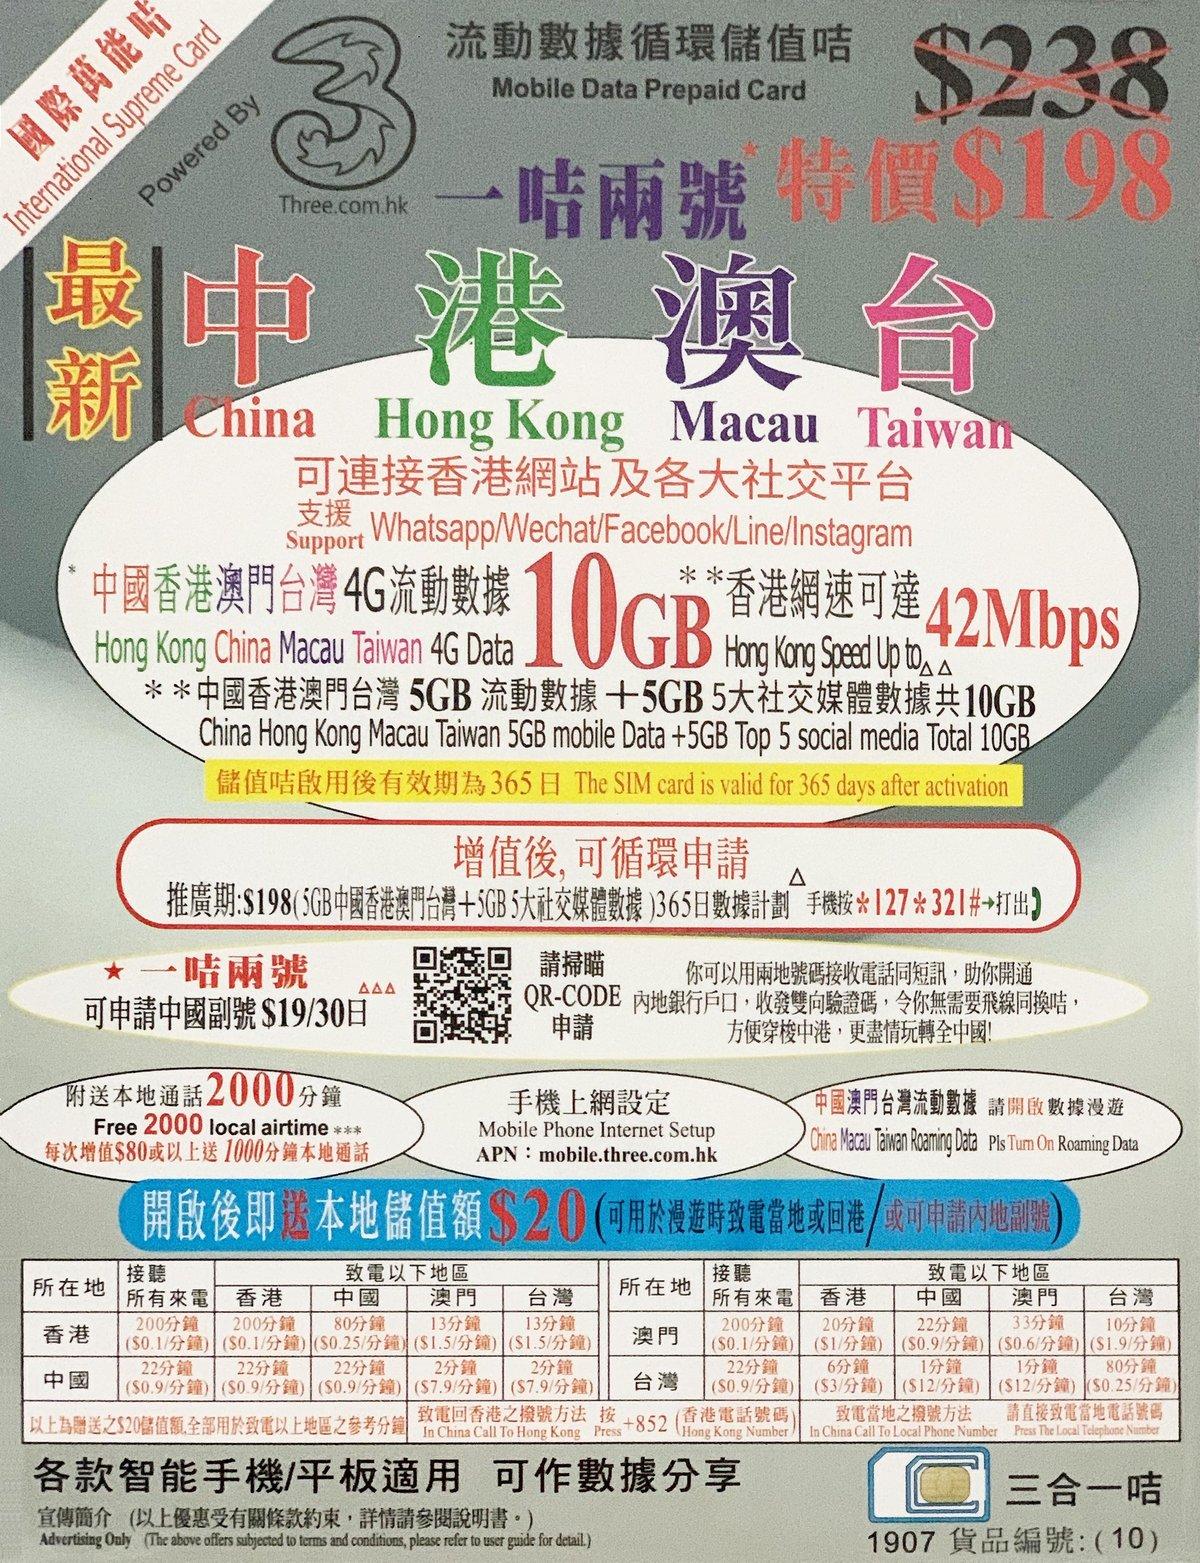 3HK | 3HK(NEW Upgrade)10GB/ HK,China,Macau,Taiwan(1 SIM dual